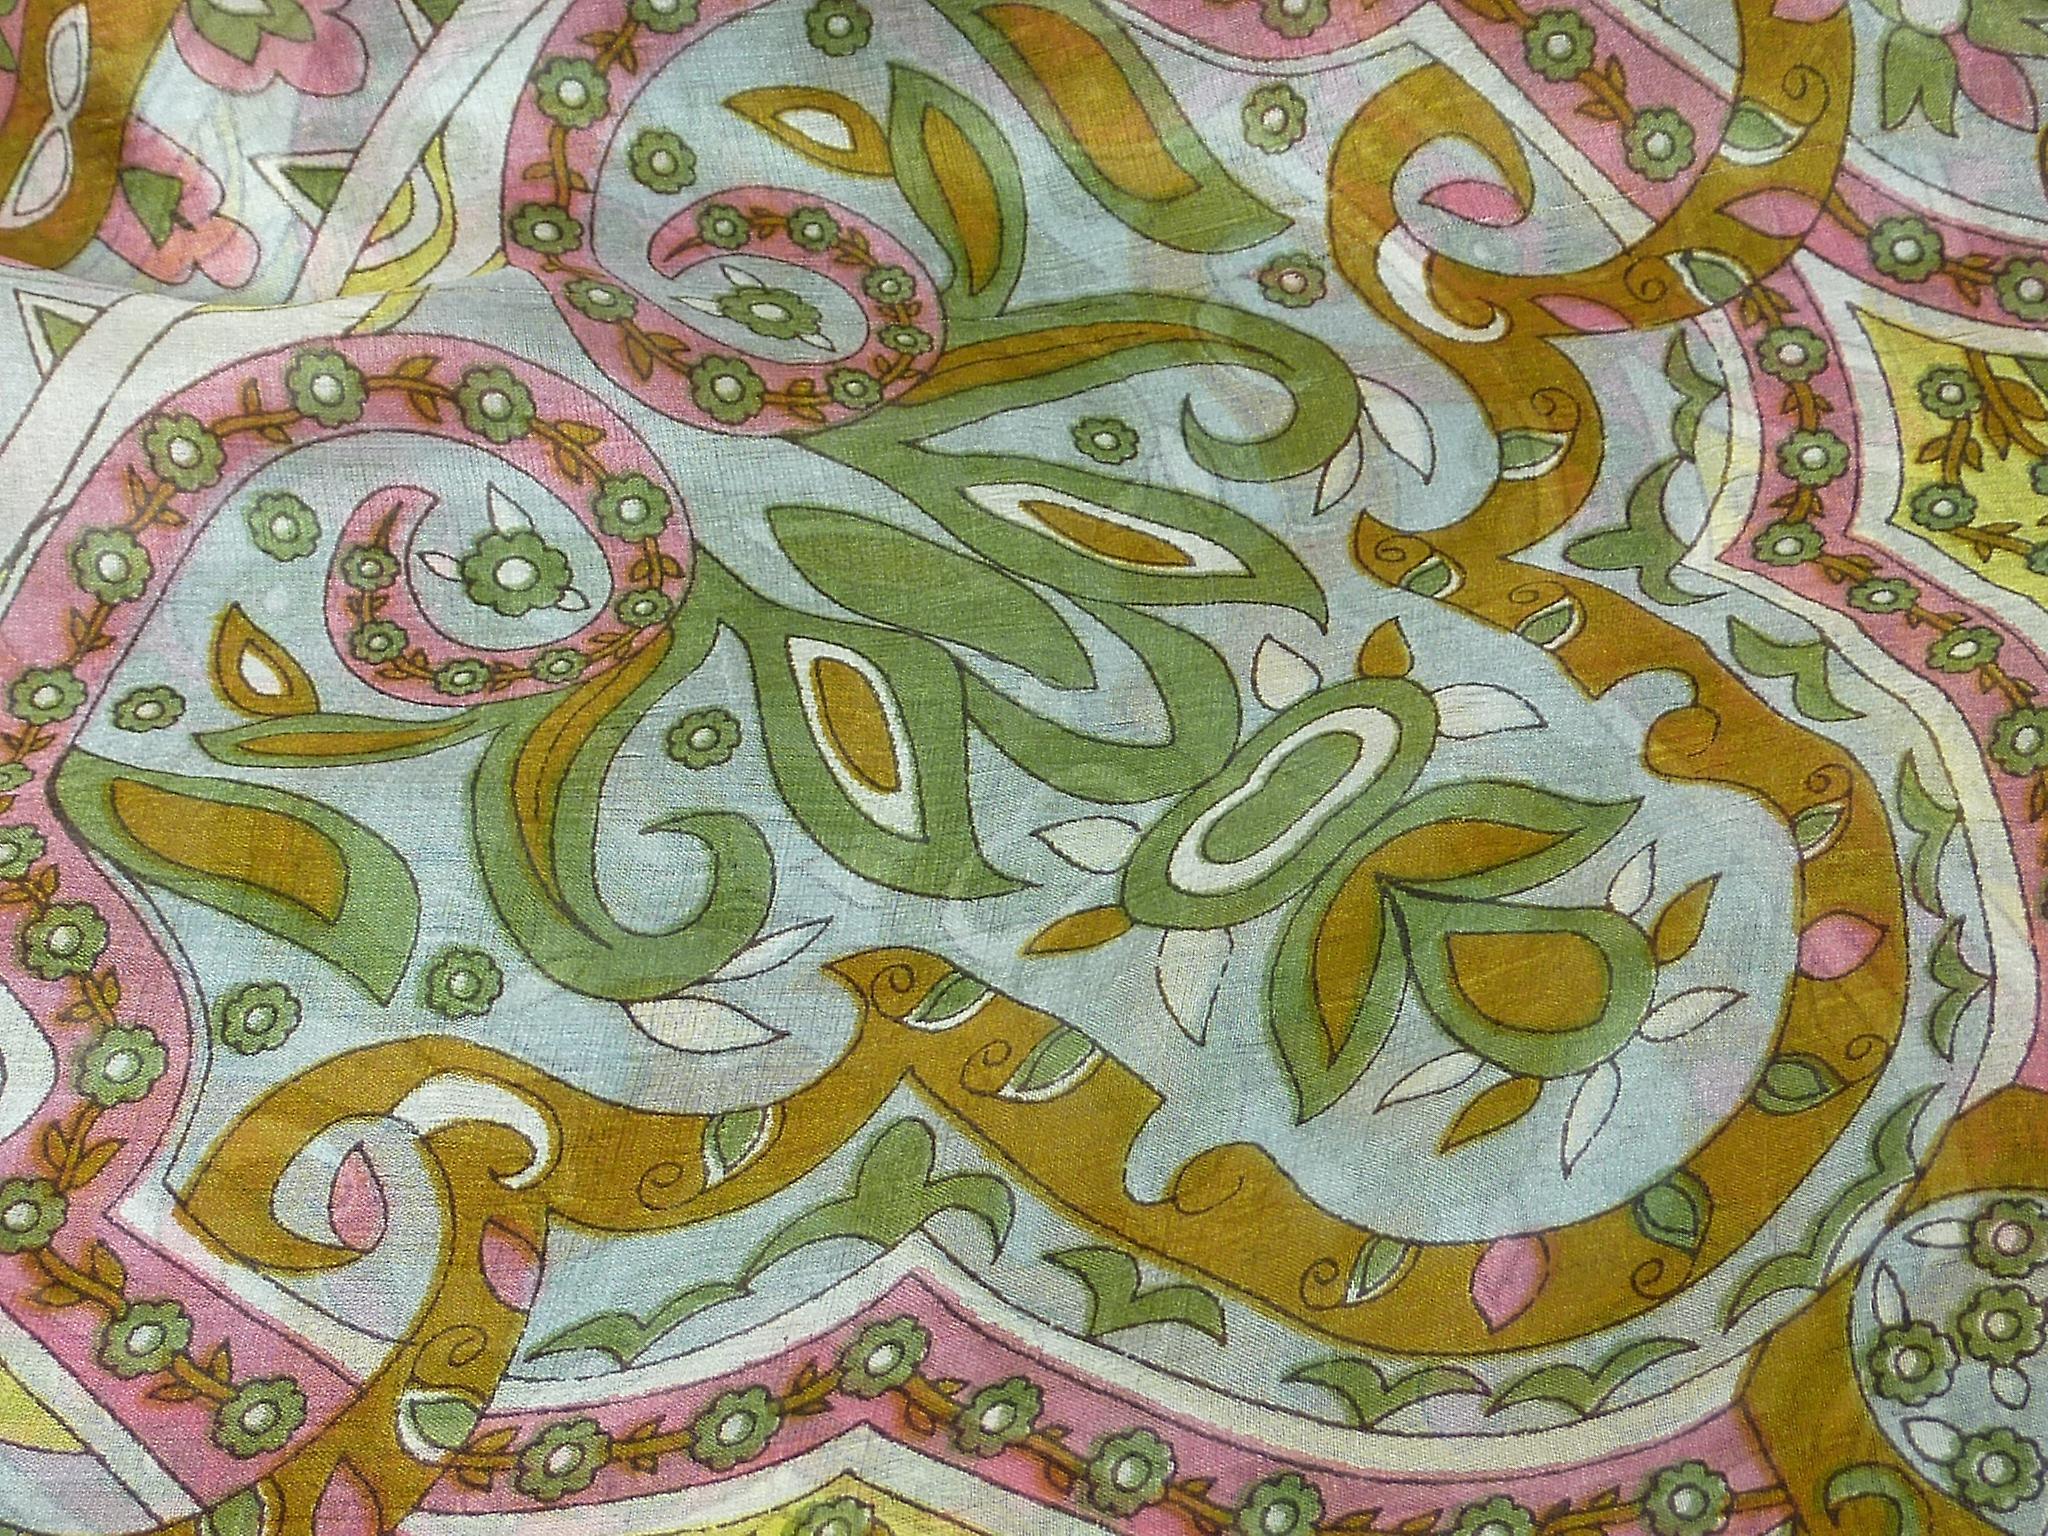 Mulberry Silk Classic Square Scarf Mala Caramel by Pashmina & Silk